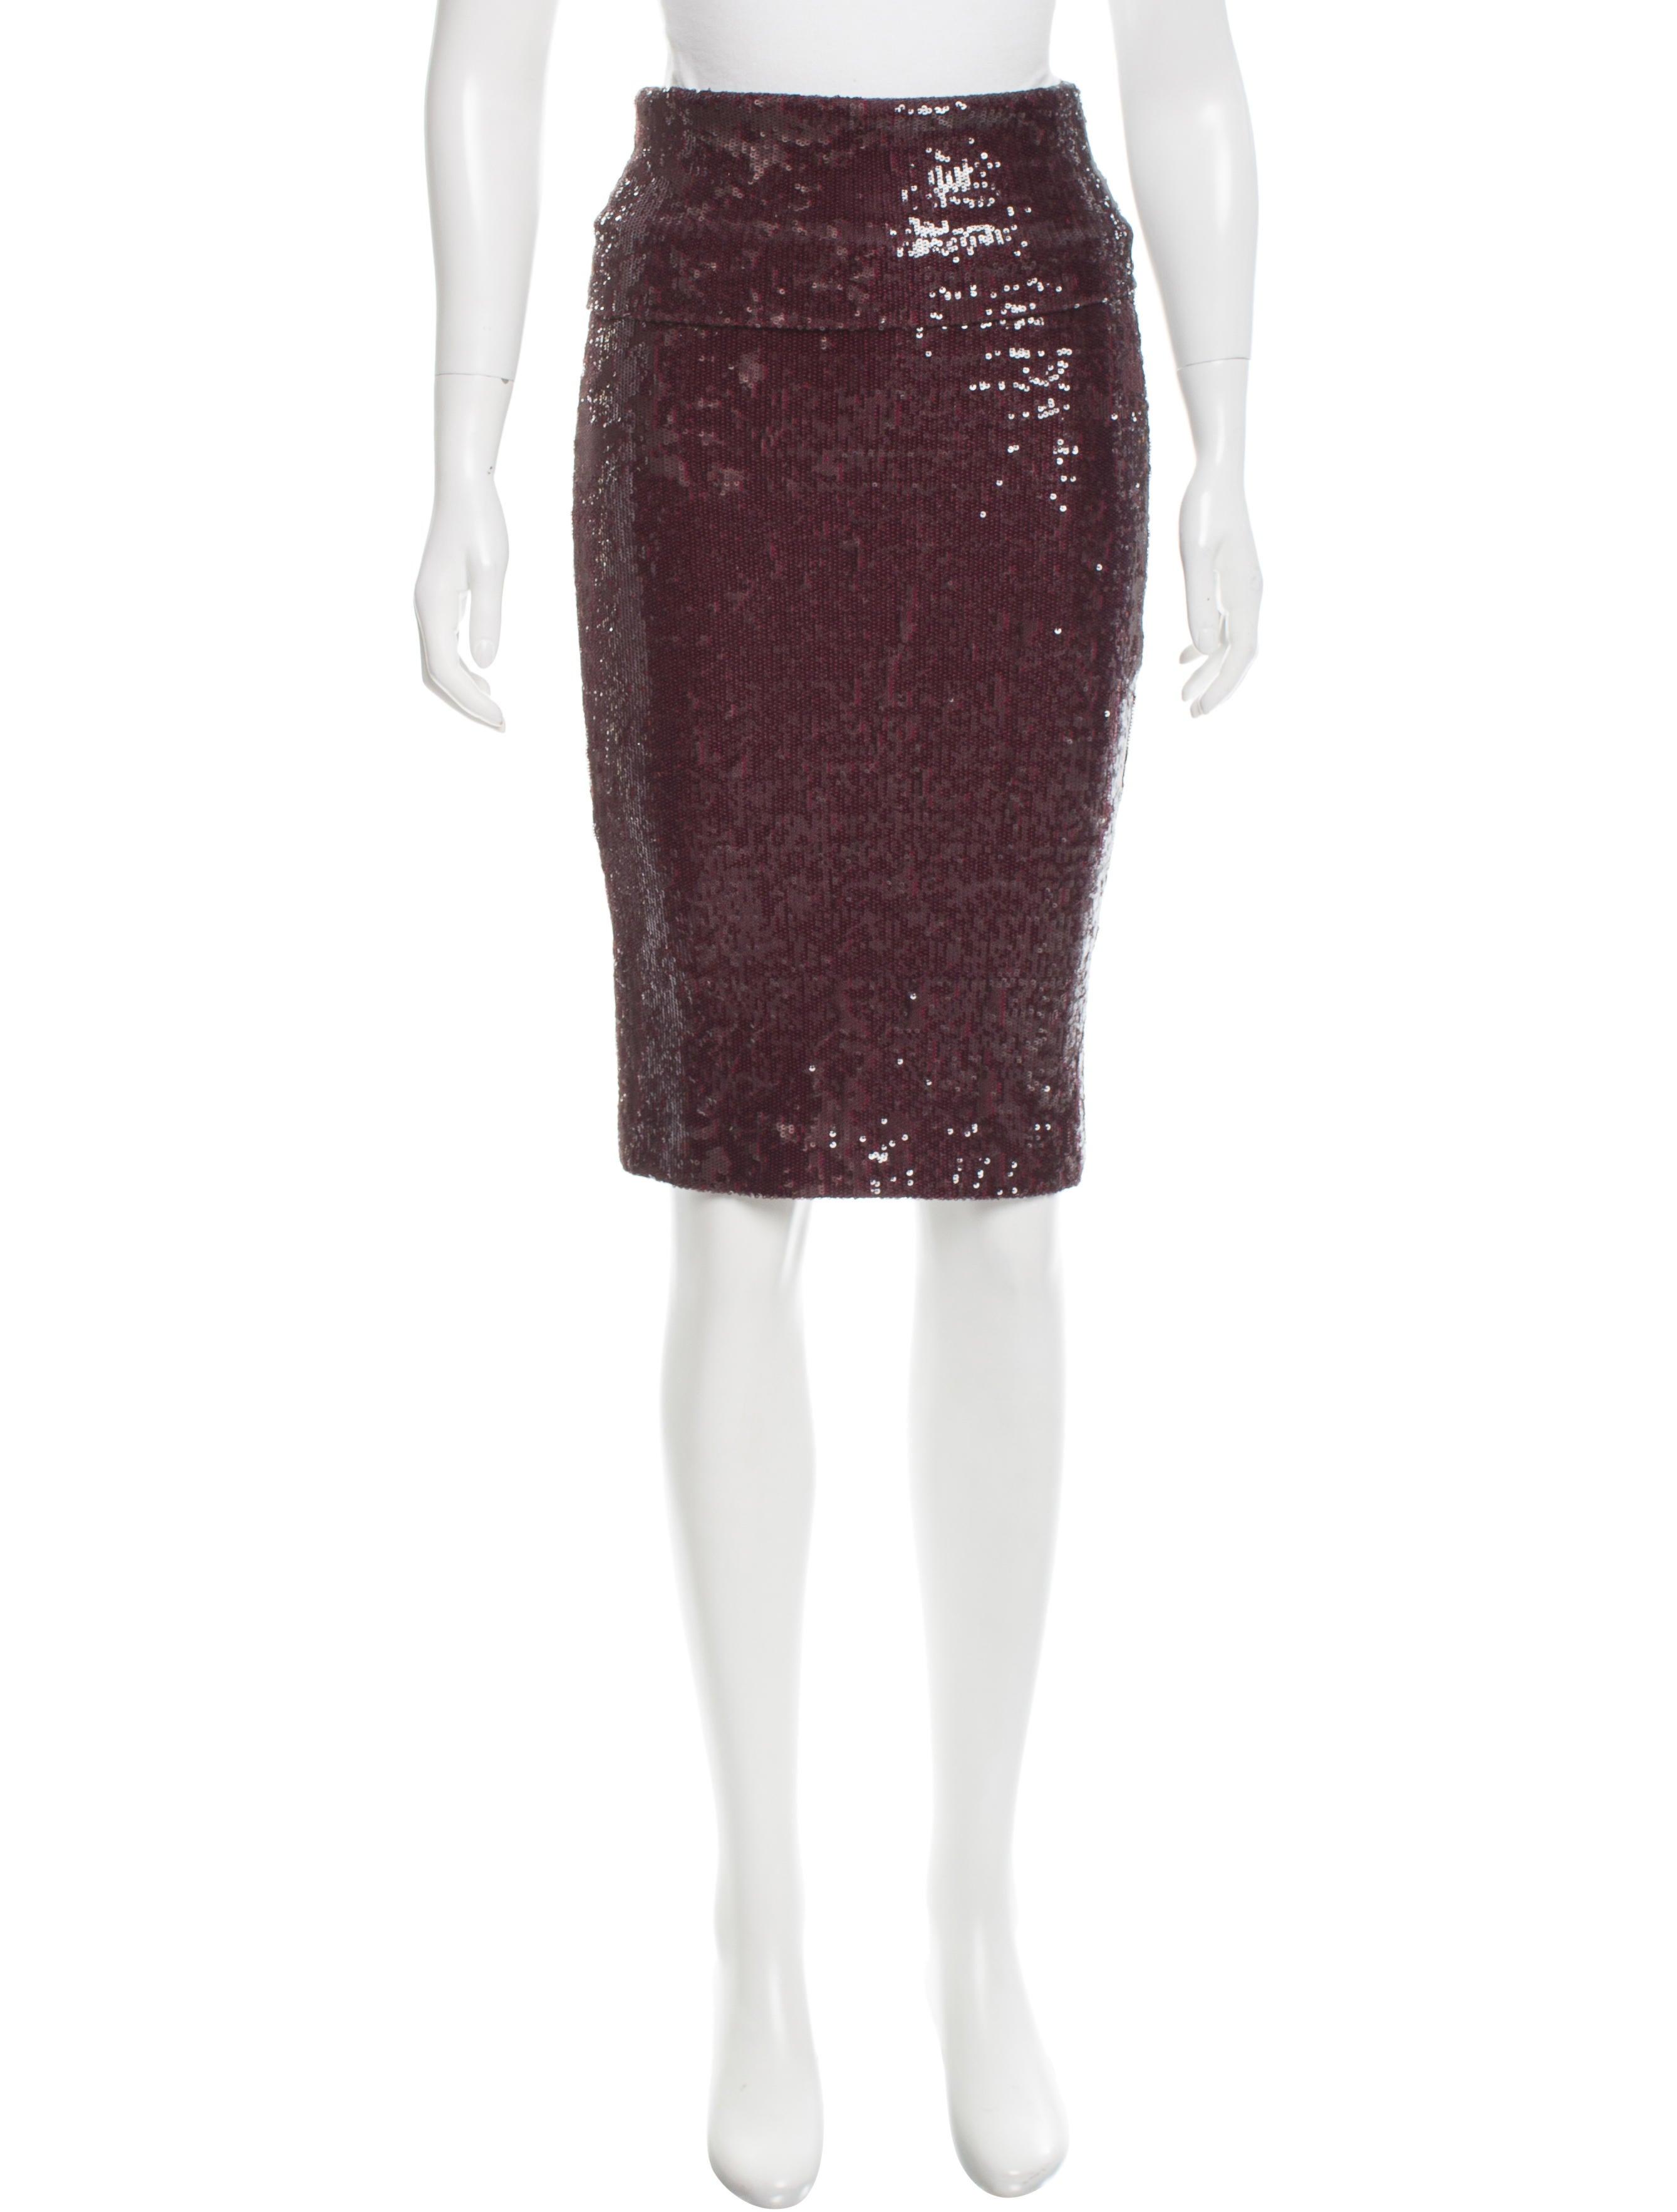 donna karan sequin knee length skirt w tags clothing